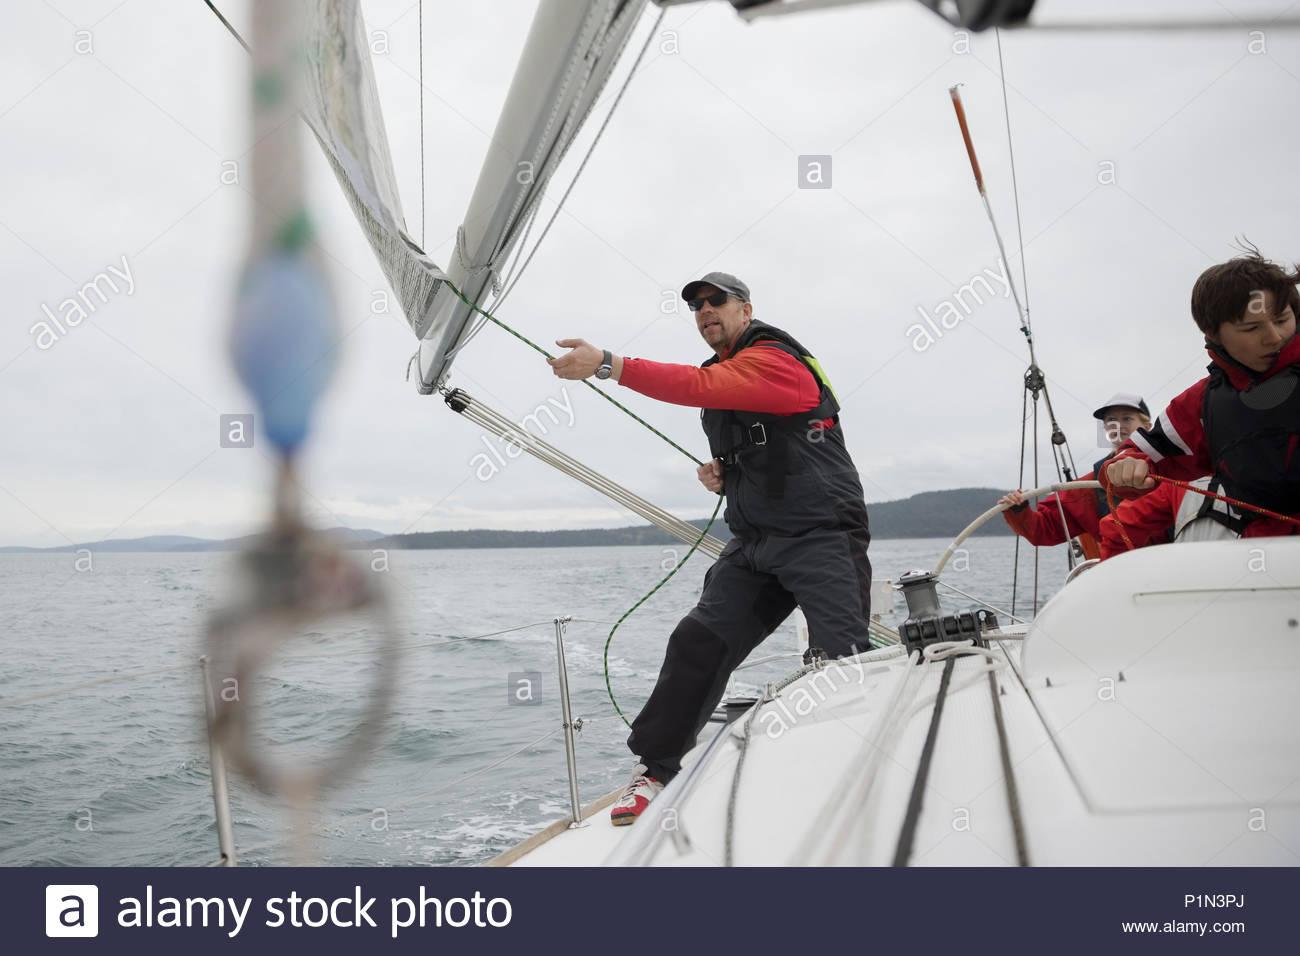 Sailing team training on sailboat on ocean - Stock Image